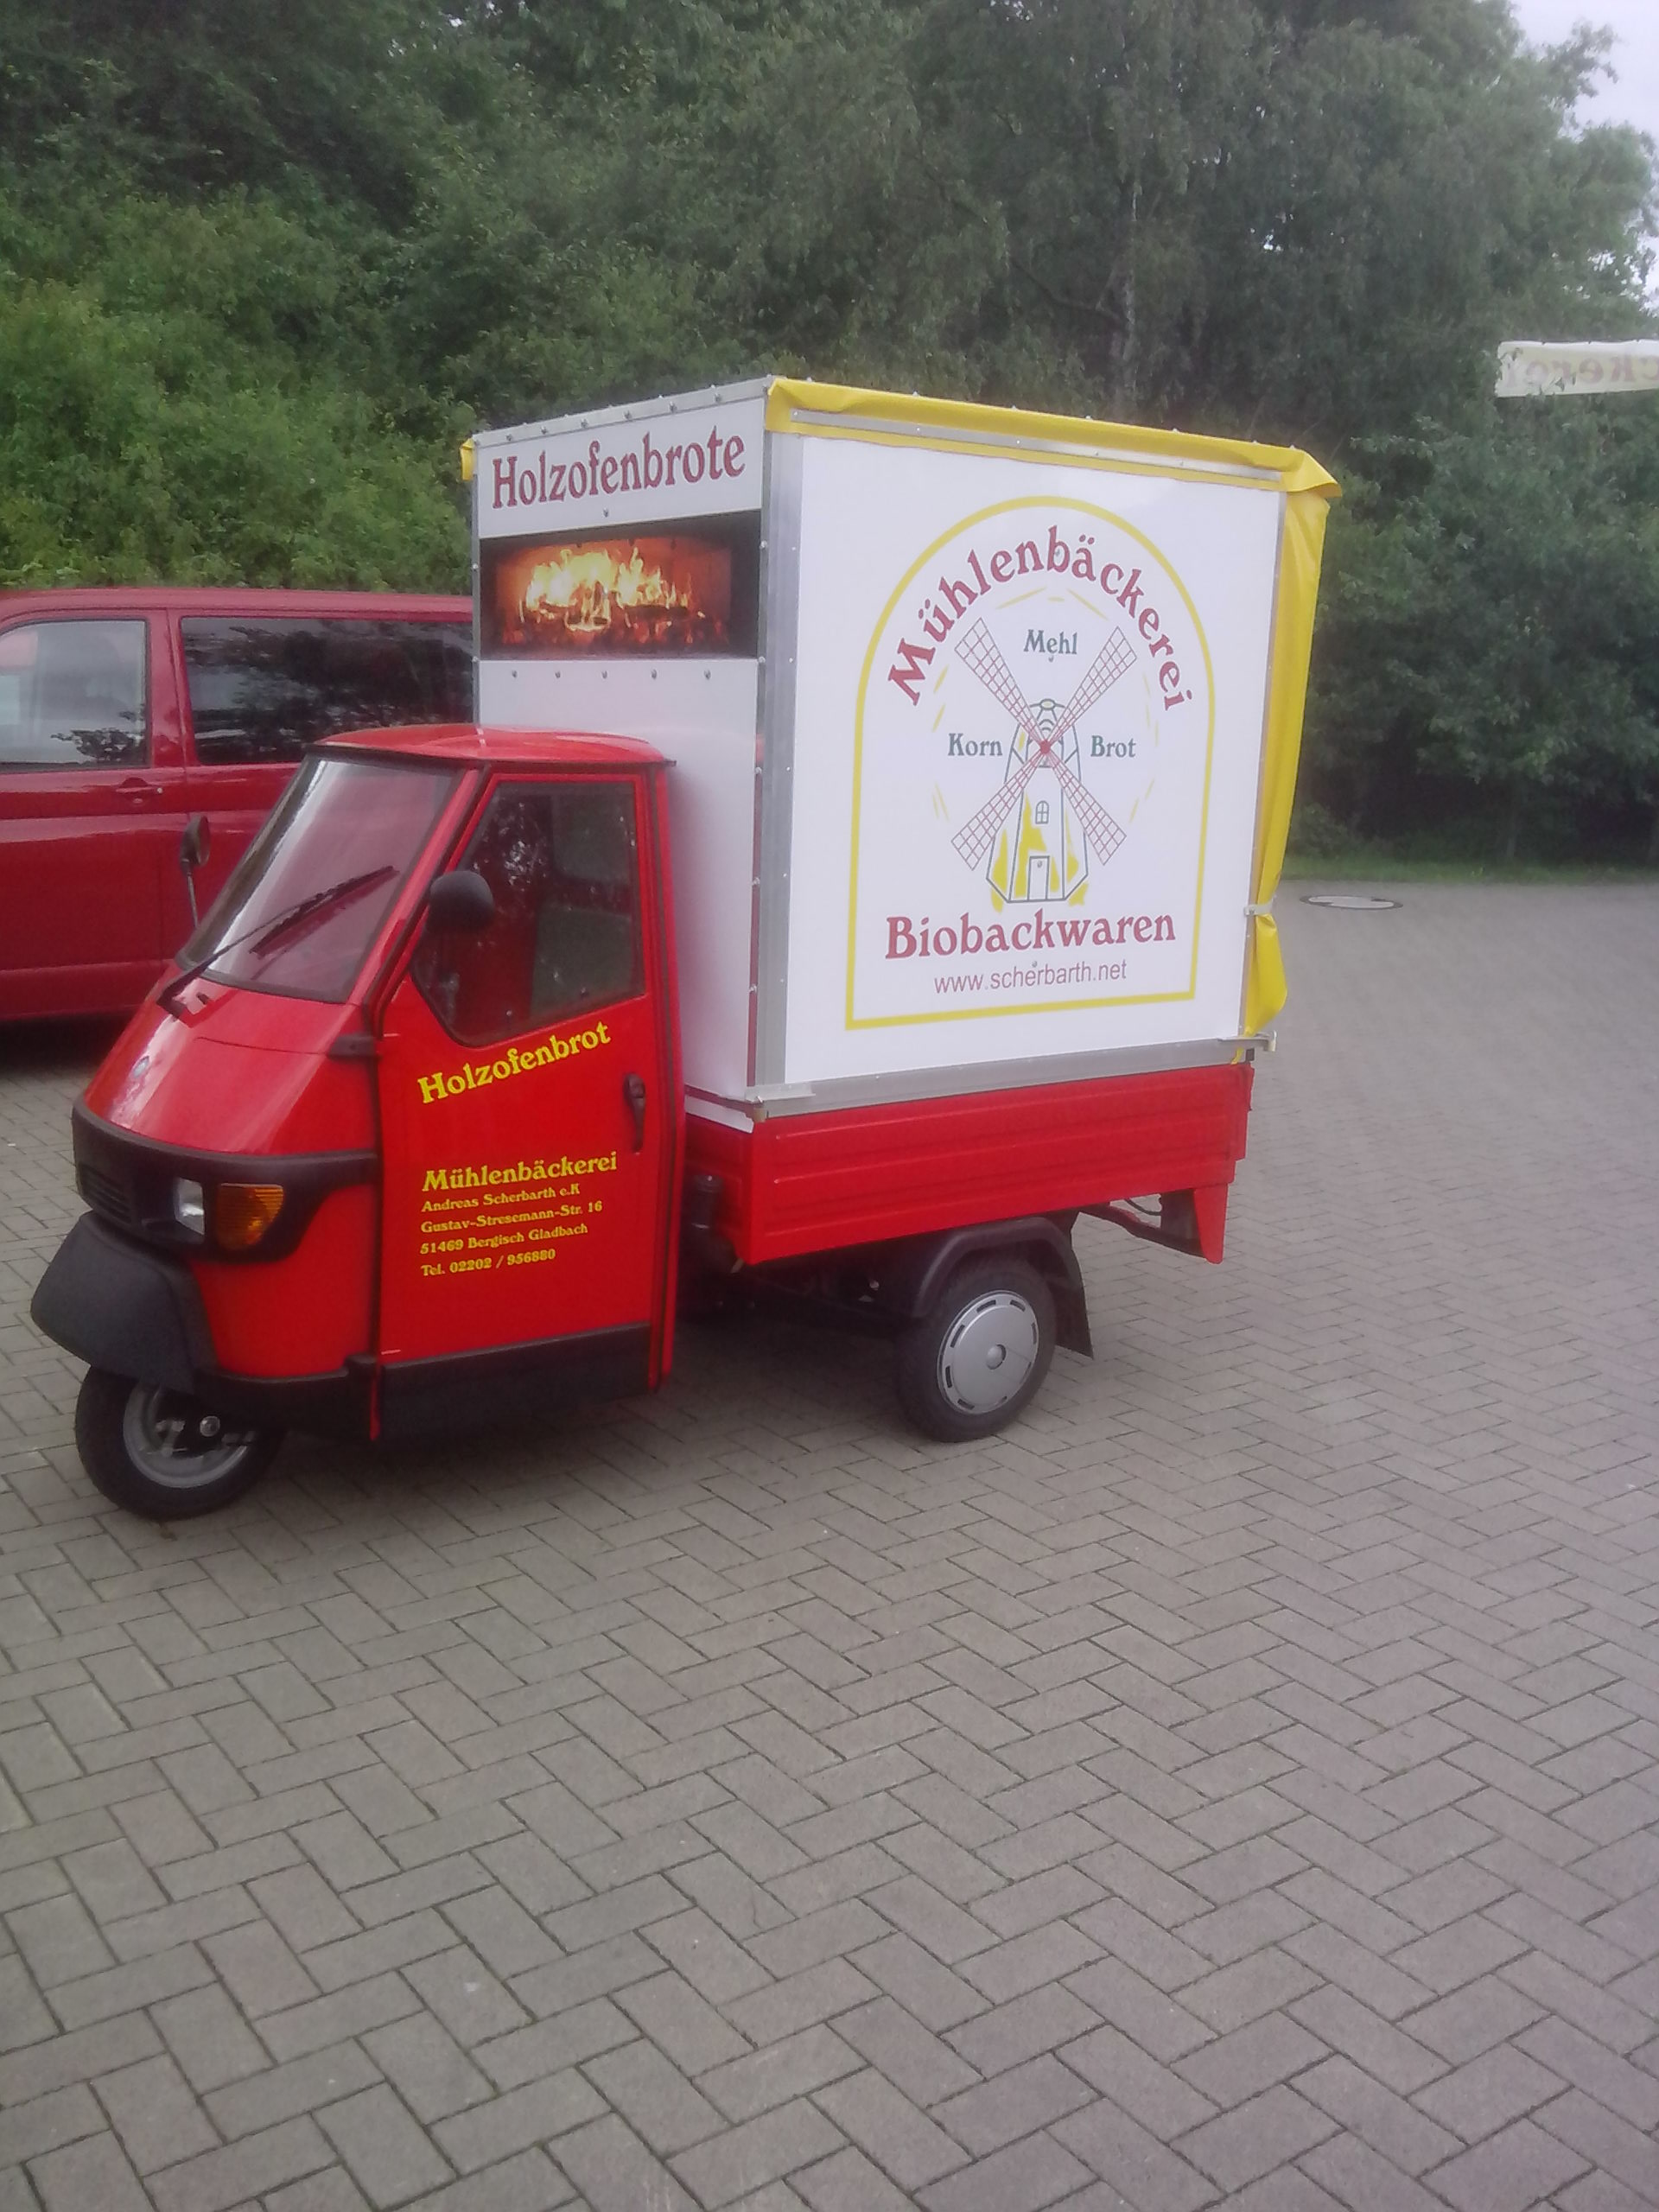 Mühlenbäckerei Andreas Scherbarth e.K.